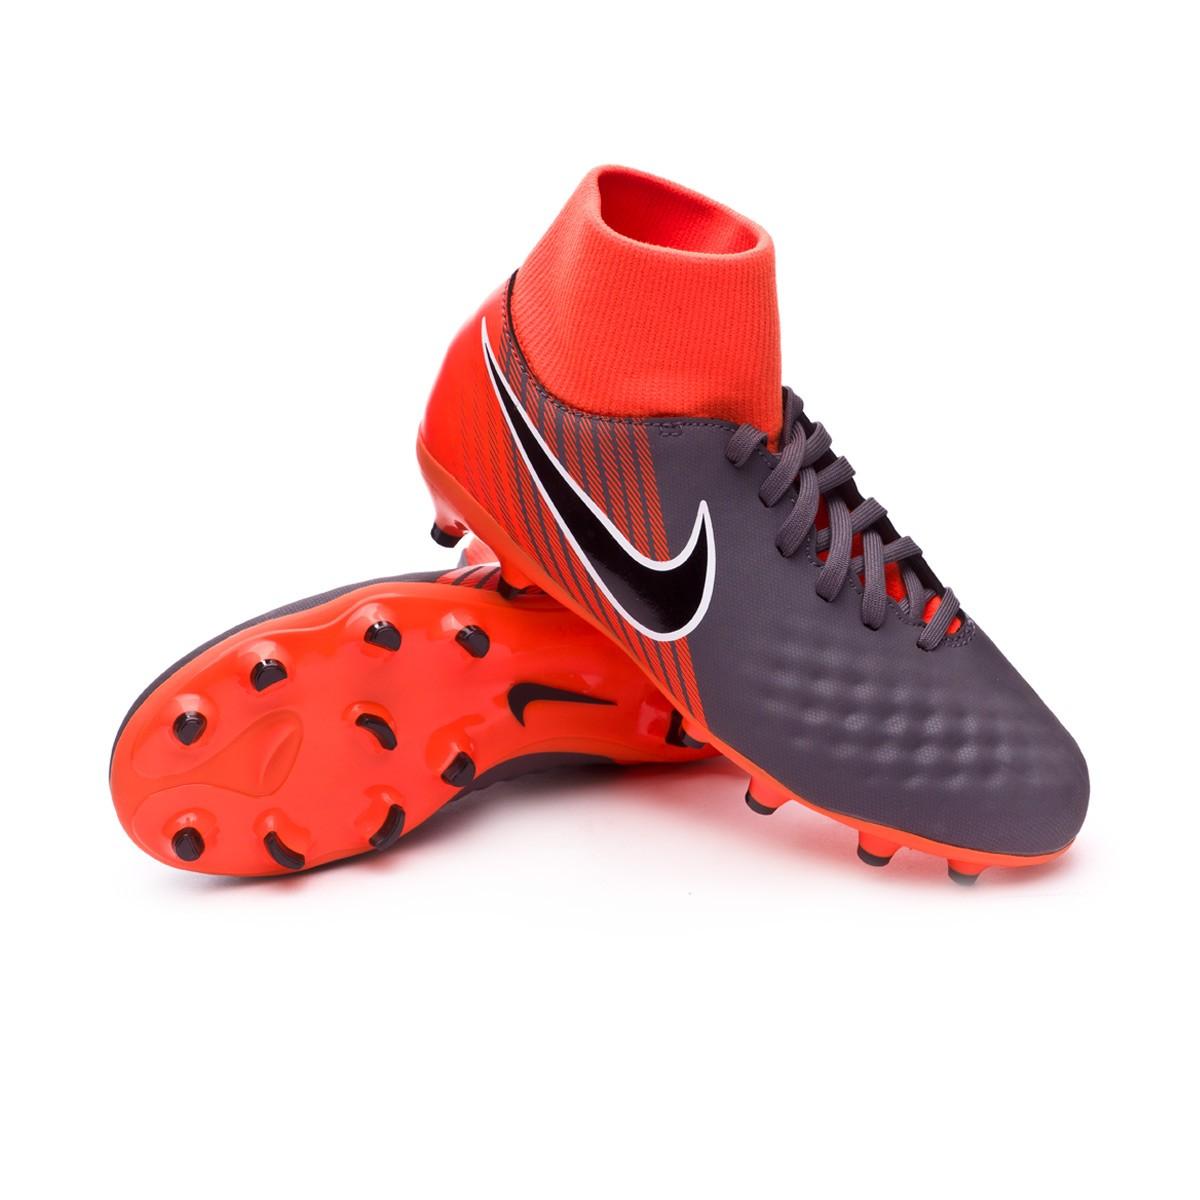 648cdd37bb0 Nike Kids Magista Obra II Academy DF FG Football Boots. Dark grey-Black-Total  orange-White ...